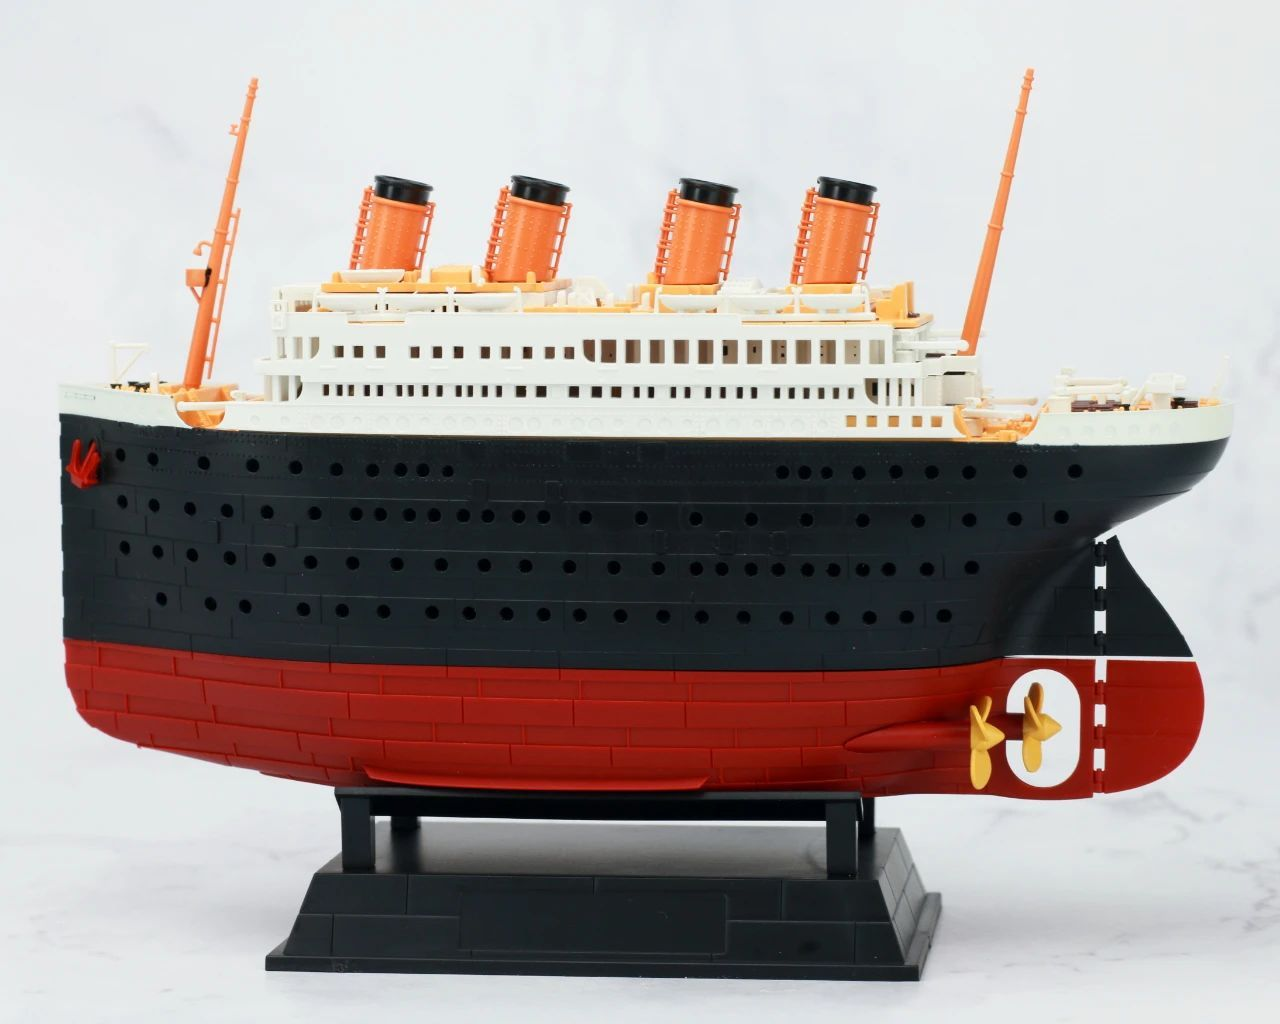 S484_1_2_RMS_Titanic_ice_SOUTHAMPTON_018.jpg